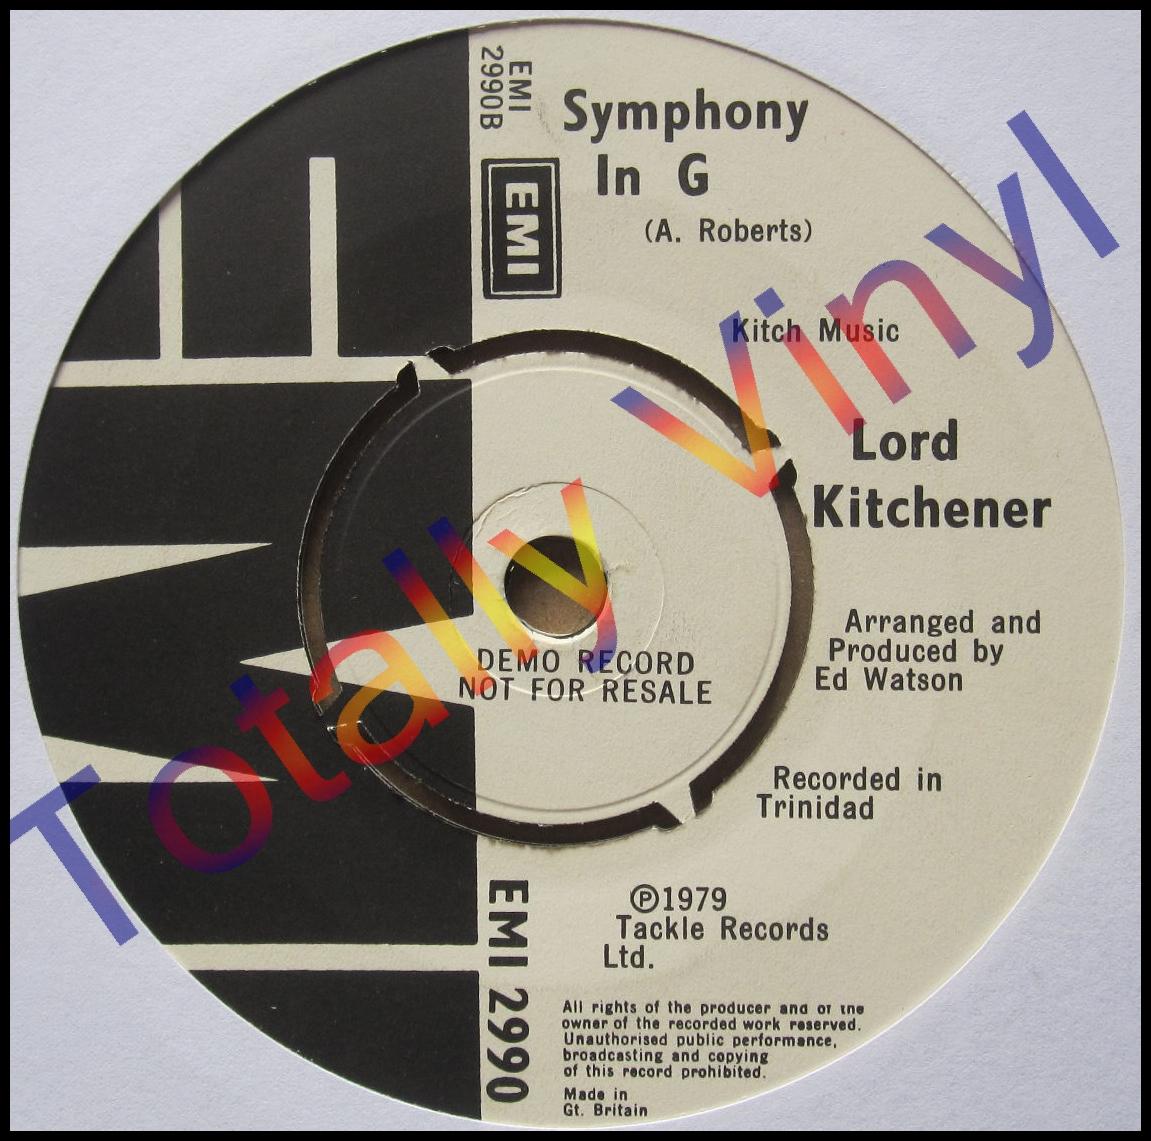 Kitchener Record: Kitchener, Lord - Dog Bite You